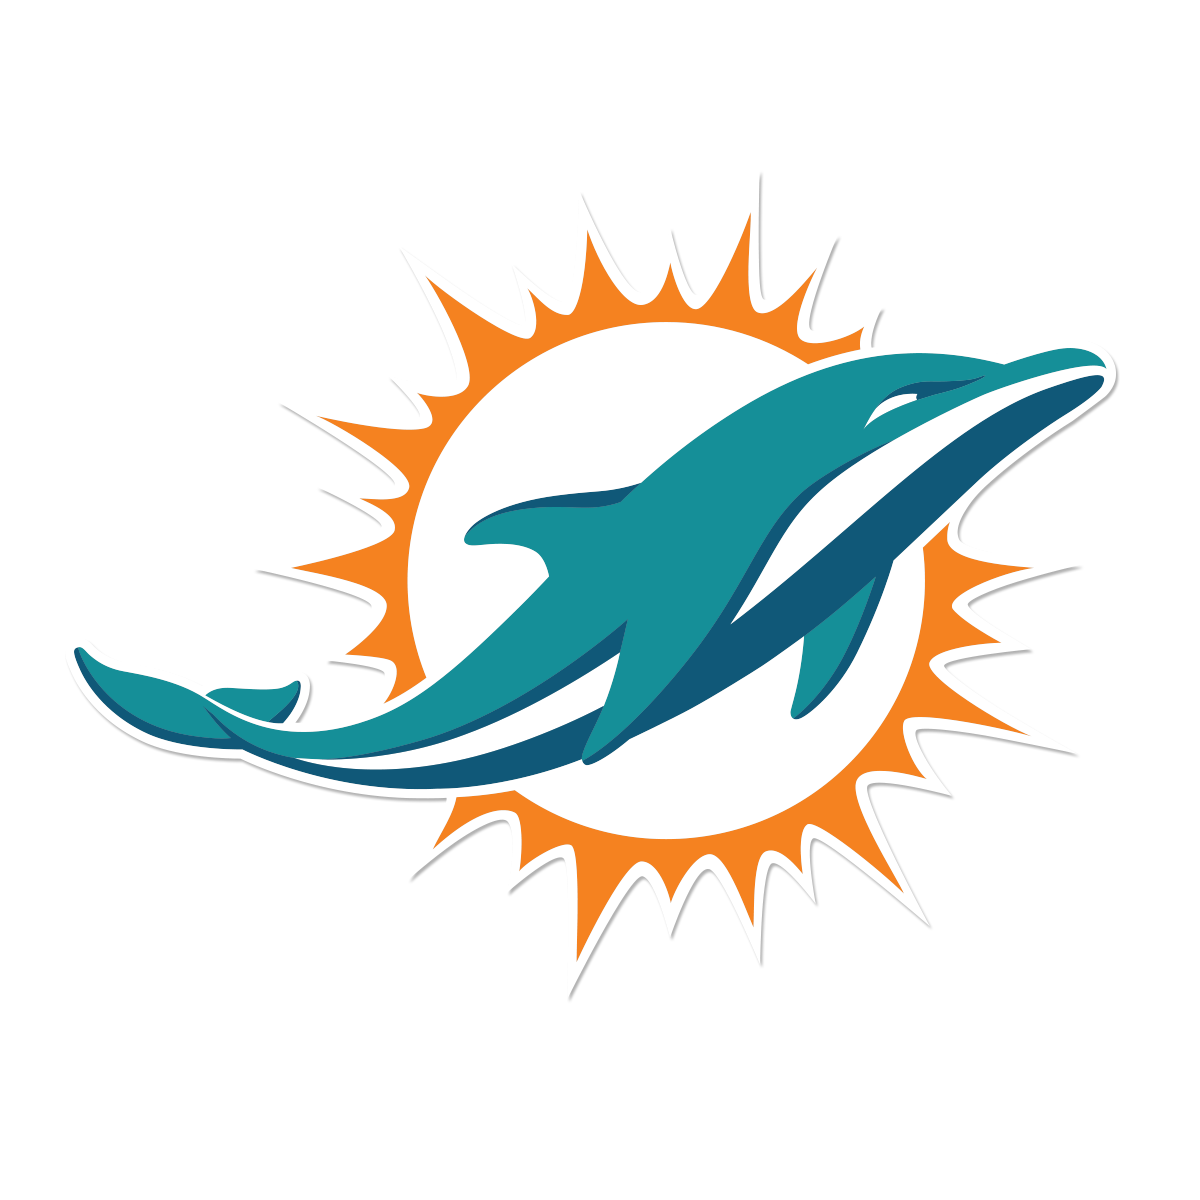 Free Miami Dolphins, Download Free Clip Art, Free Clip Art.